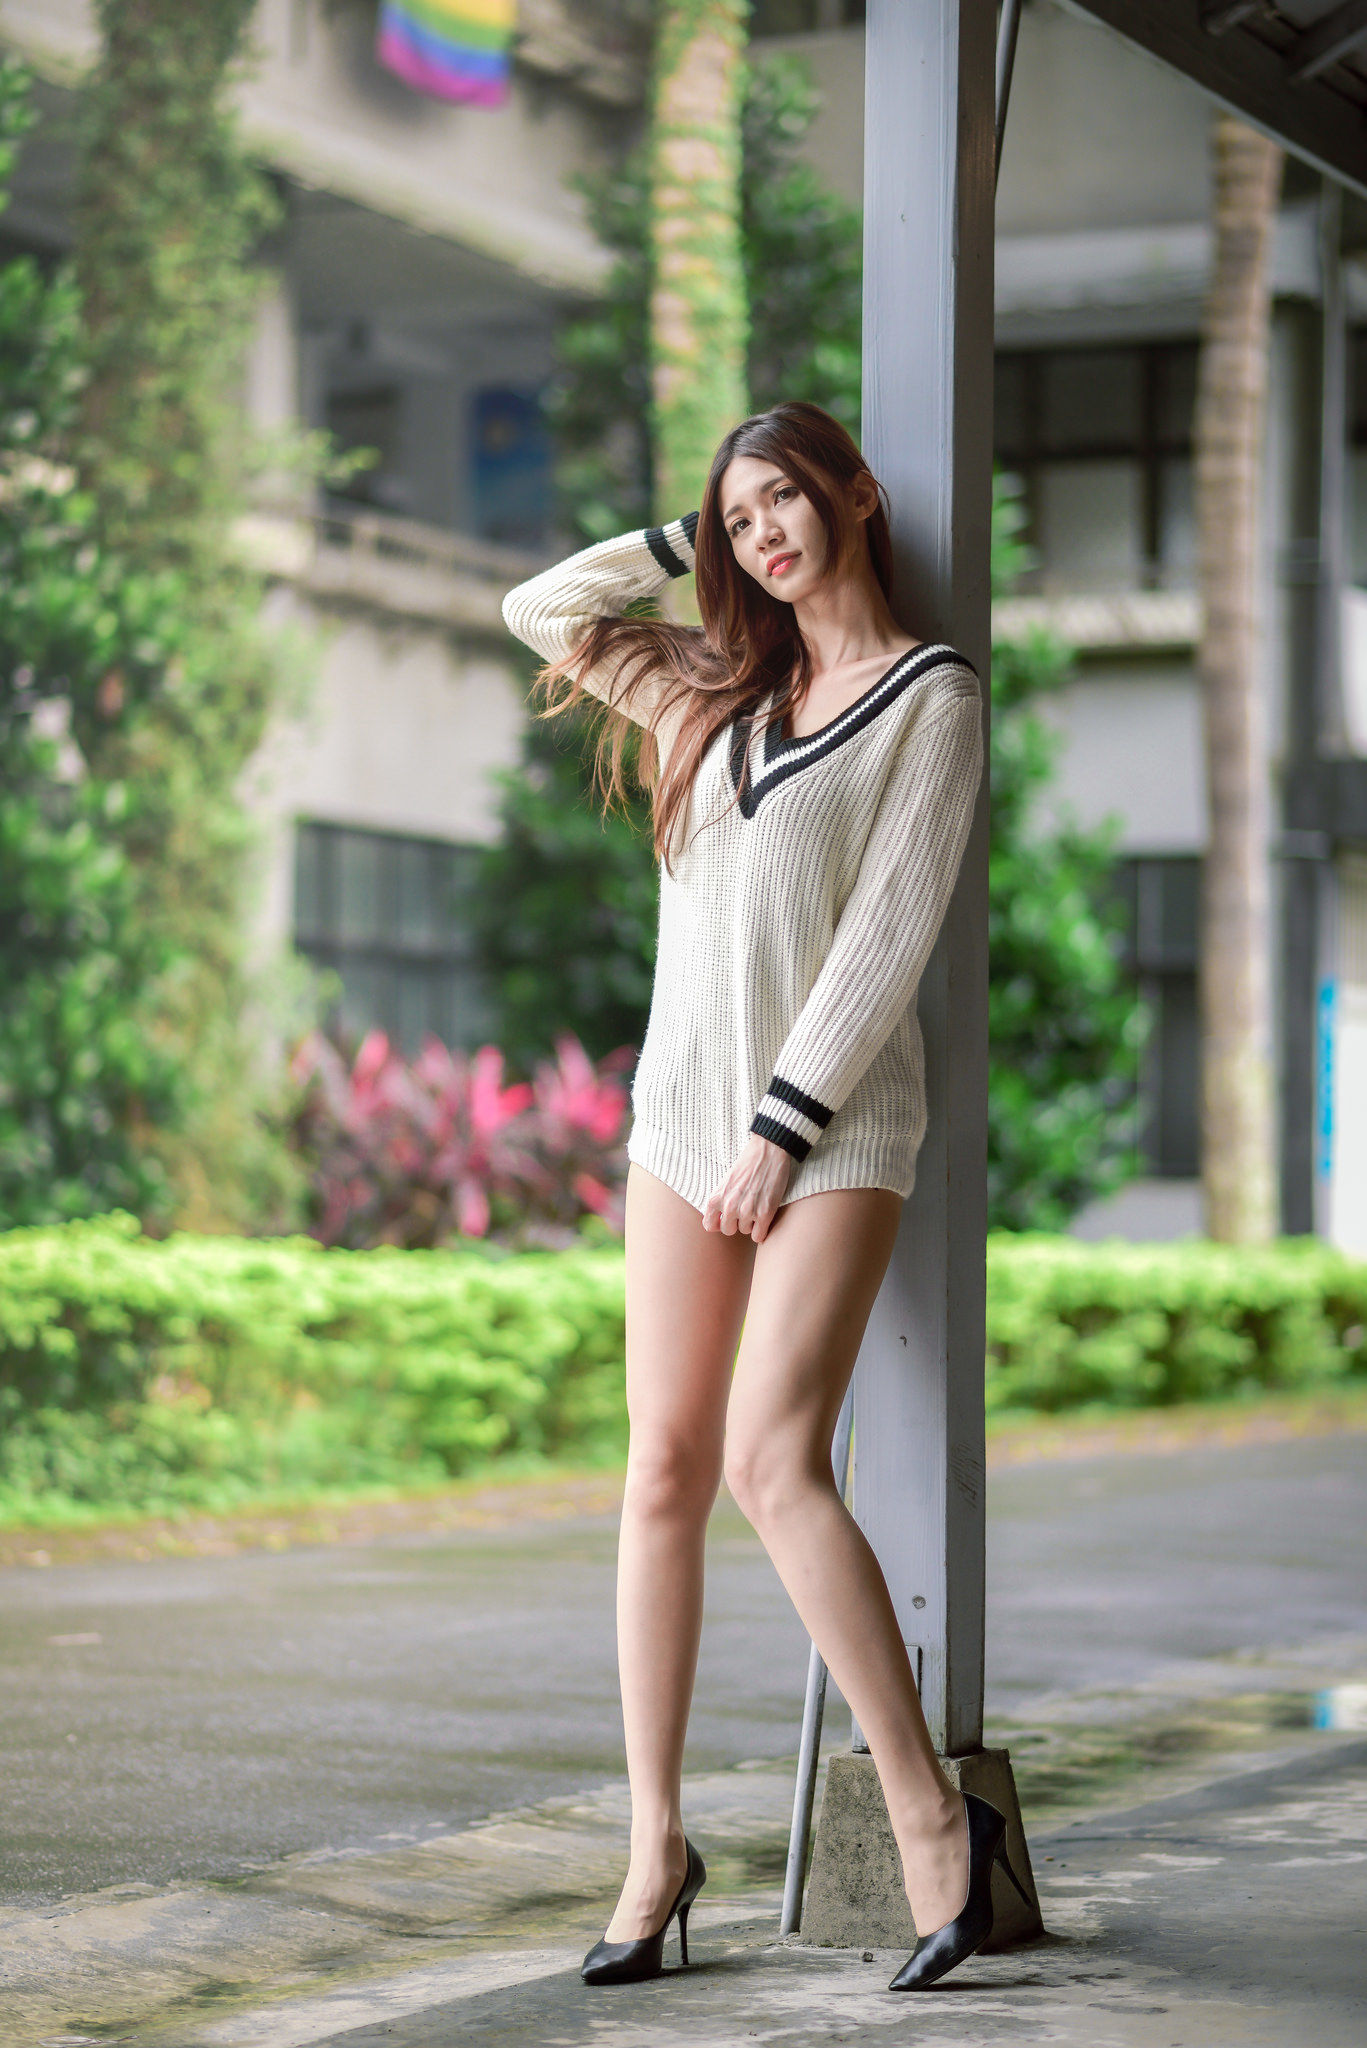 VOL.949 [台湾正妹]清新街拍正妹:蔡译心(Candice)超高清个人性感漂亮大图(91P)